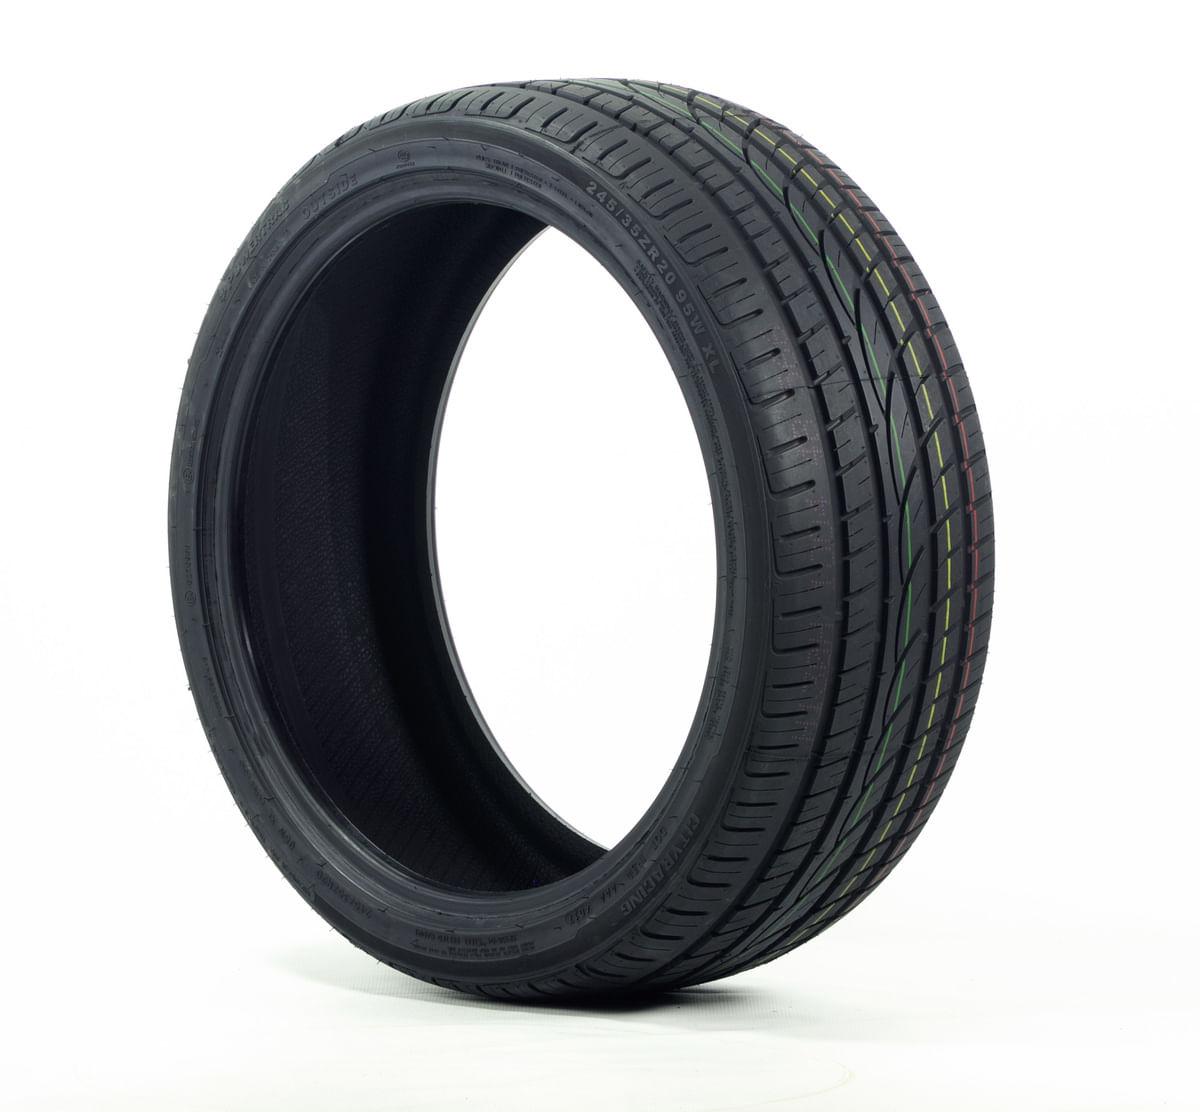 Pneu Powertrac Tires City Racing 245/35 R20